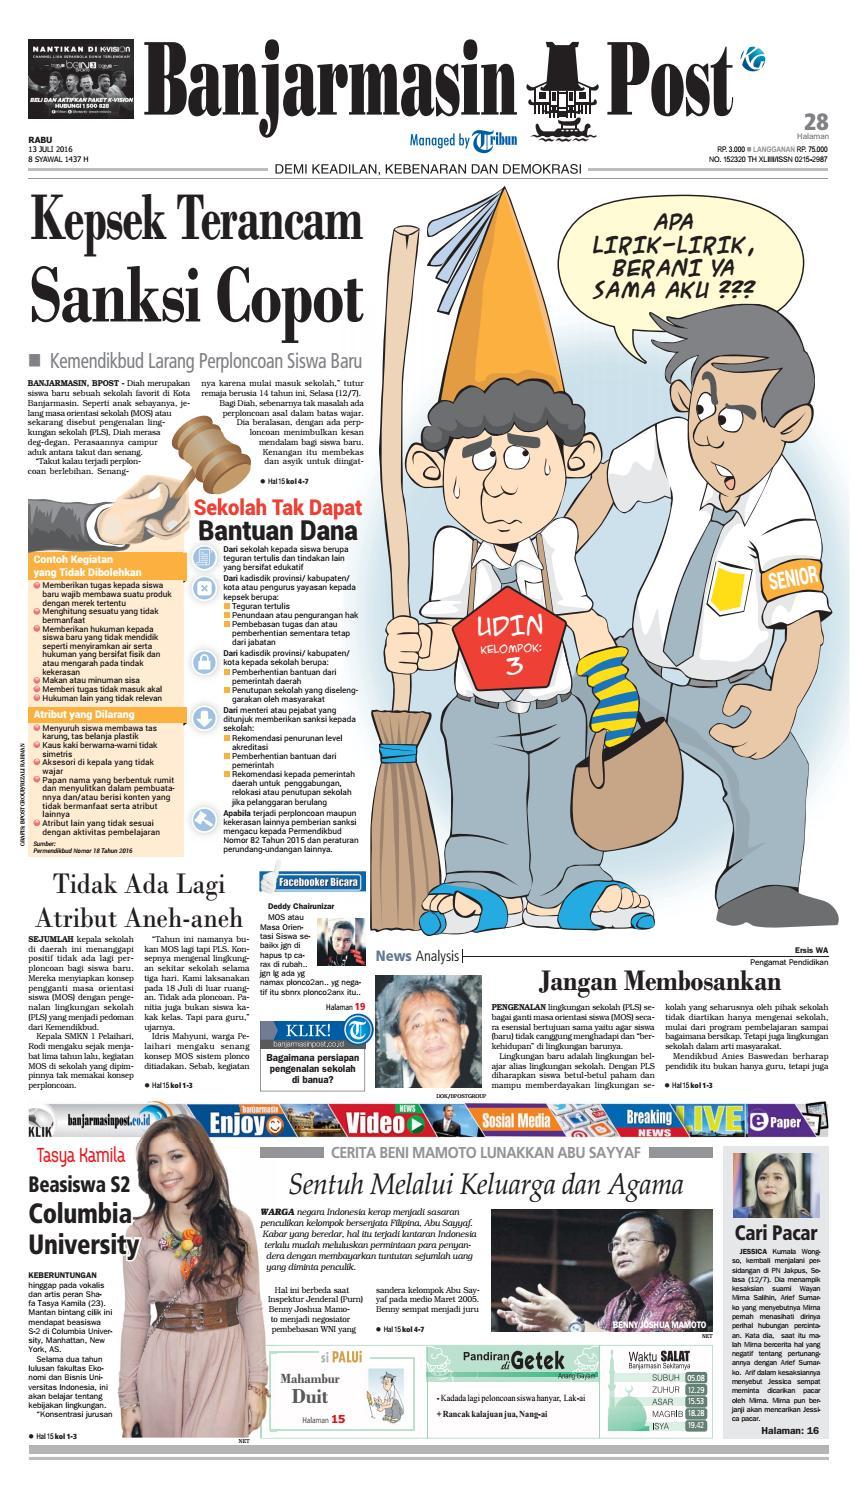 Banjarmasin Post Rabu 13 Juli 2016 By Banjarmasin Post Issuu